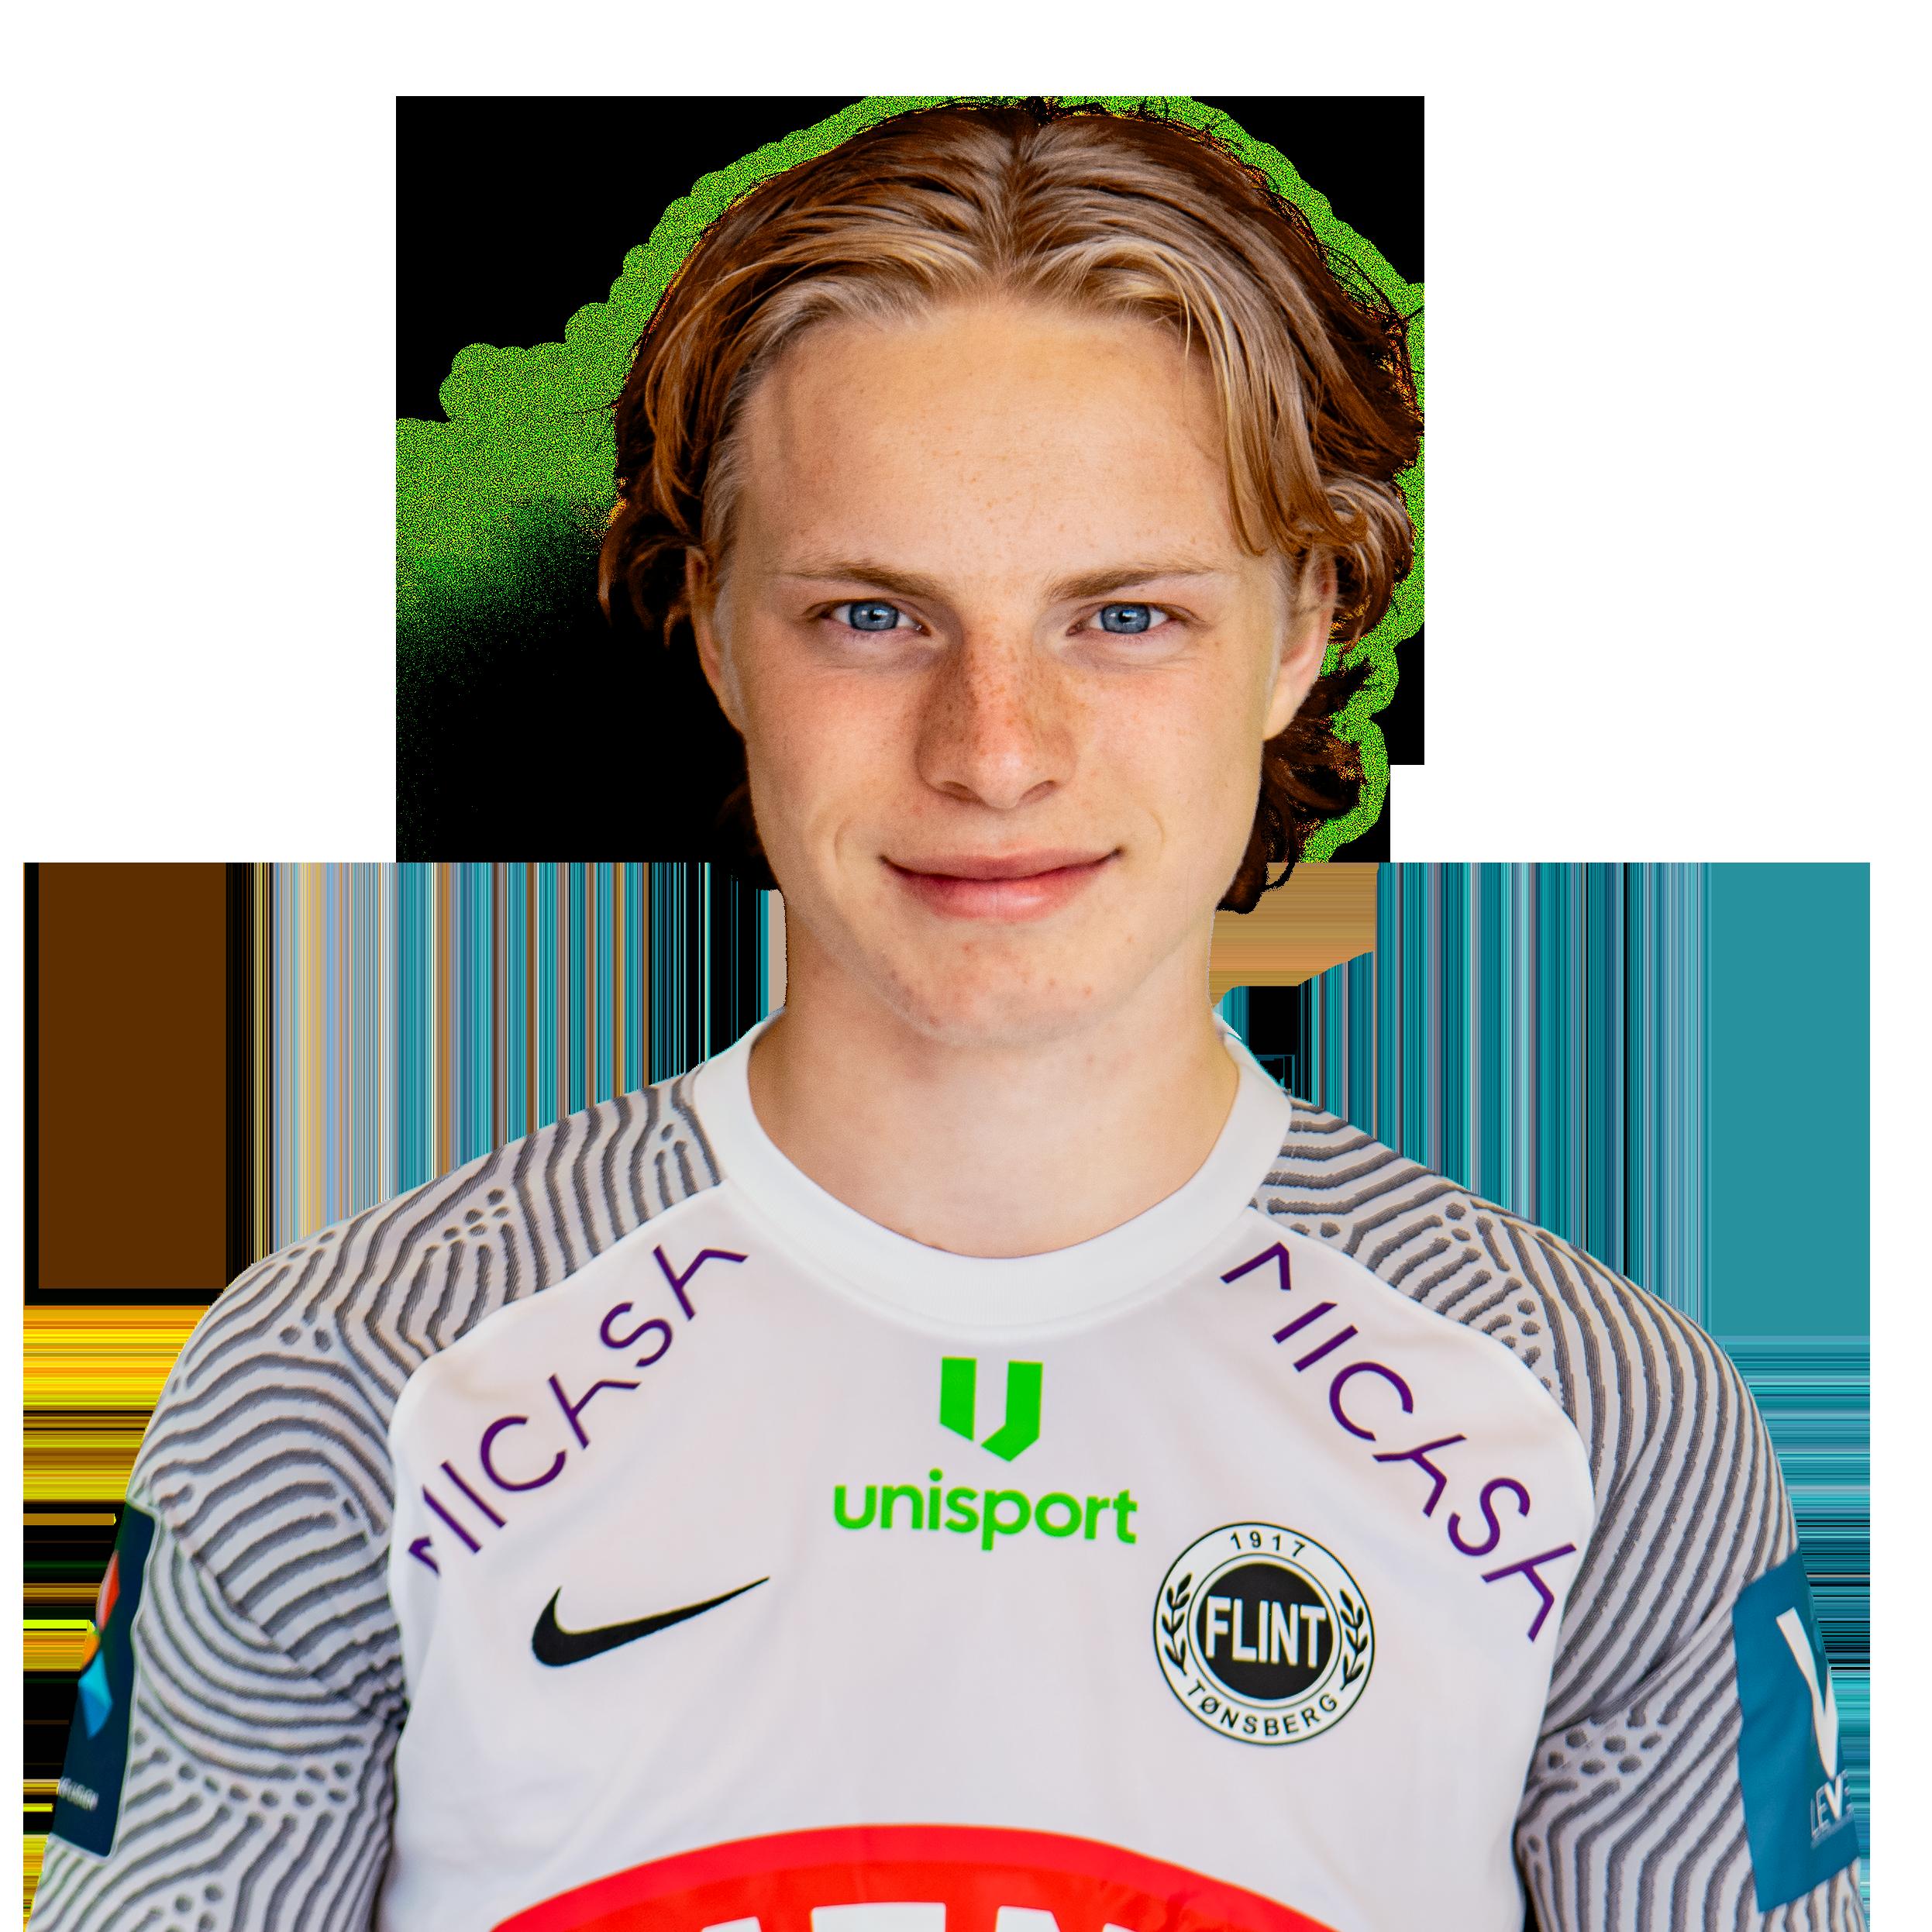 https://www.flintfotball.no/wp-content/uploads/2021/08/Mathias-Kjolner-2021.png